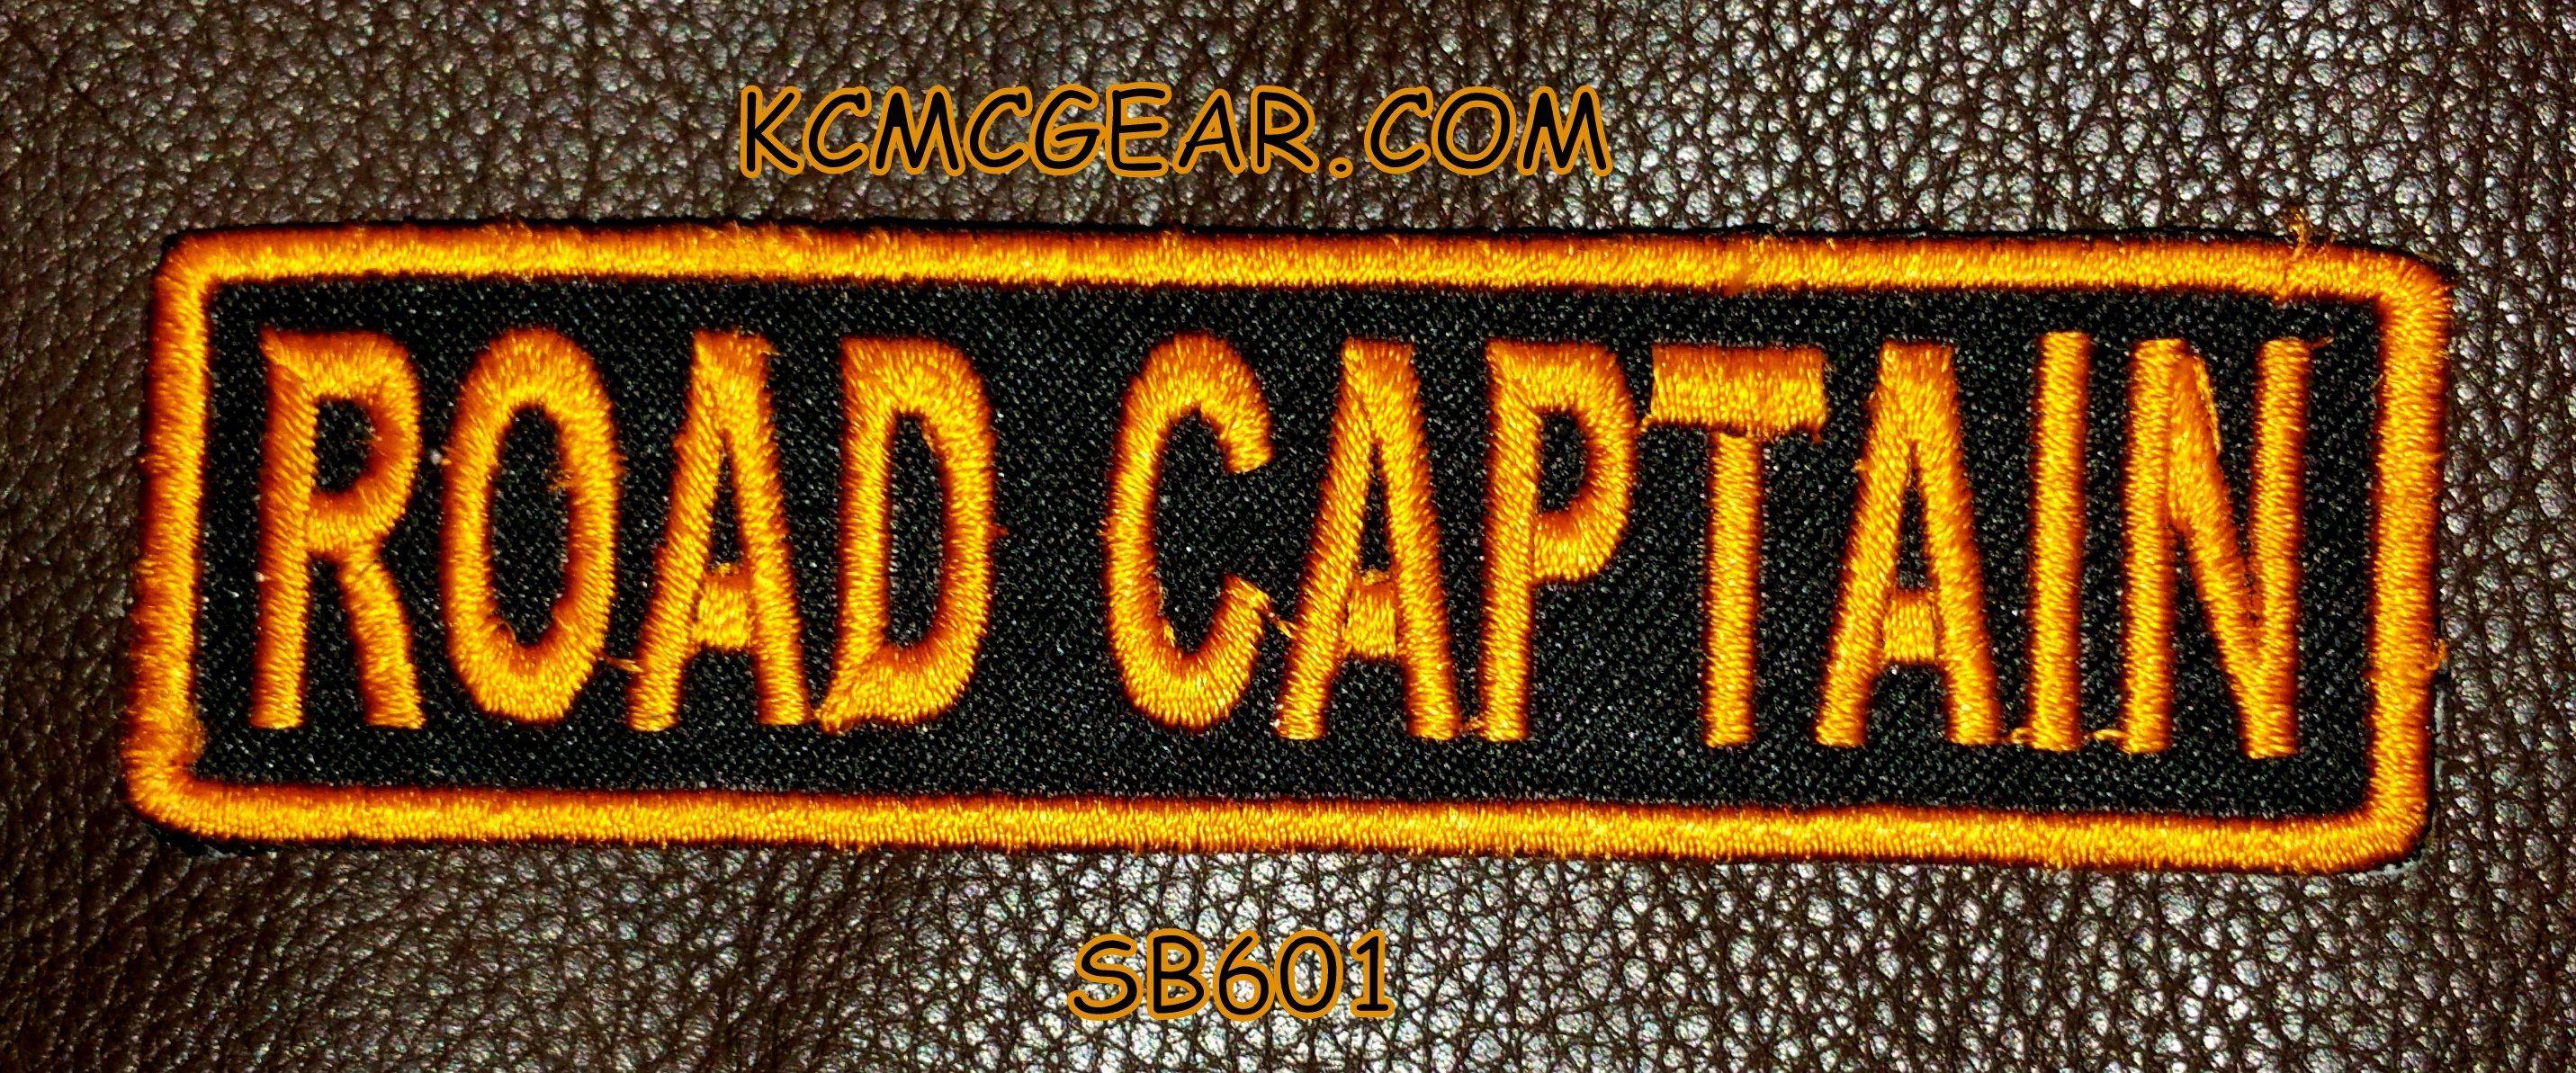 Motors Sarcasm Just Another Iron on Small Patch for Biker Vest  Jacket SB1054 Motors Apparel & Merchandise